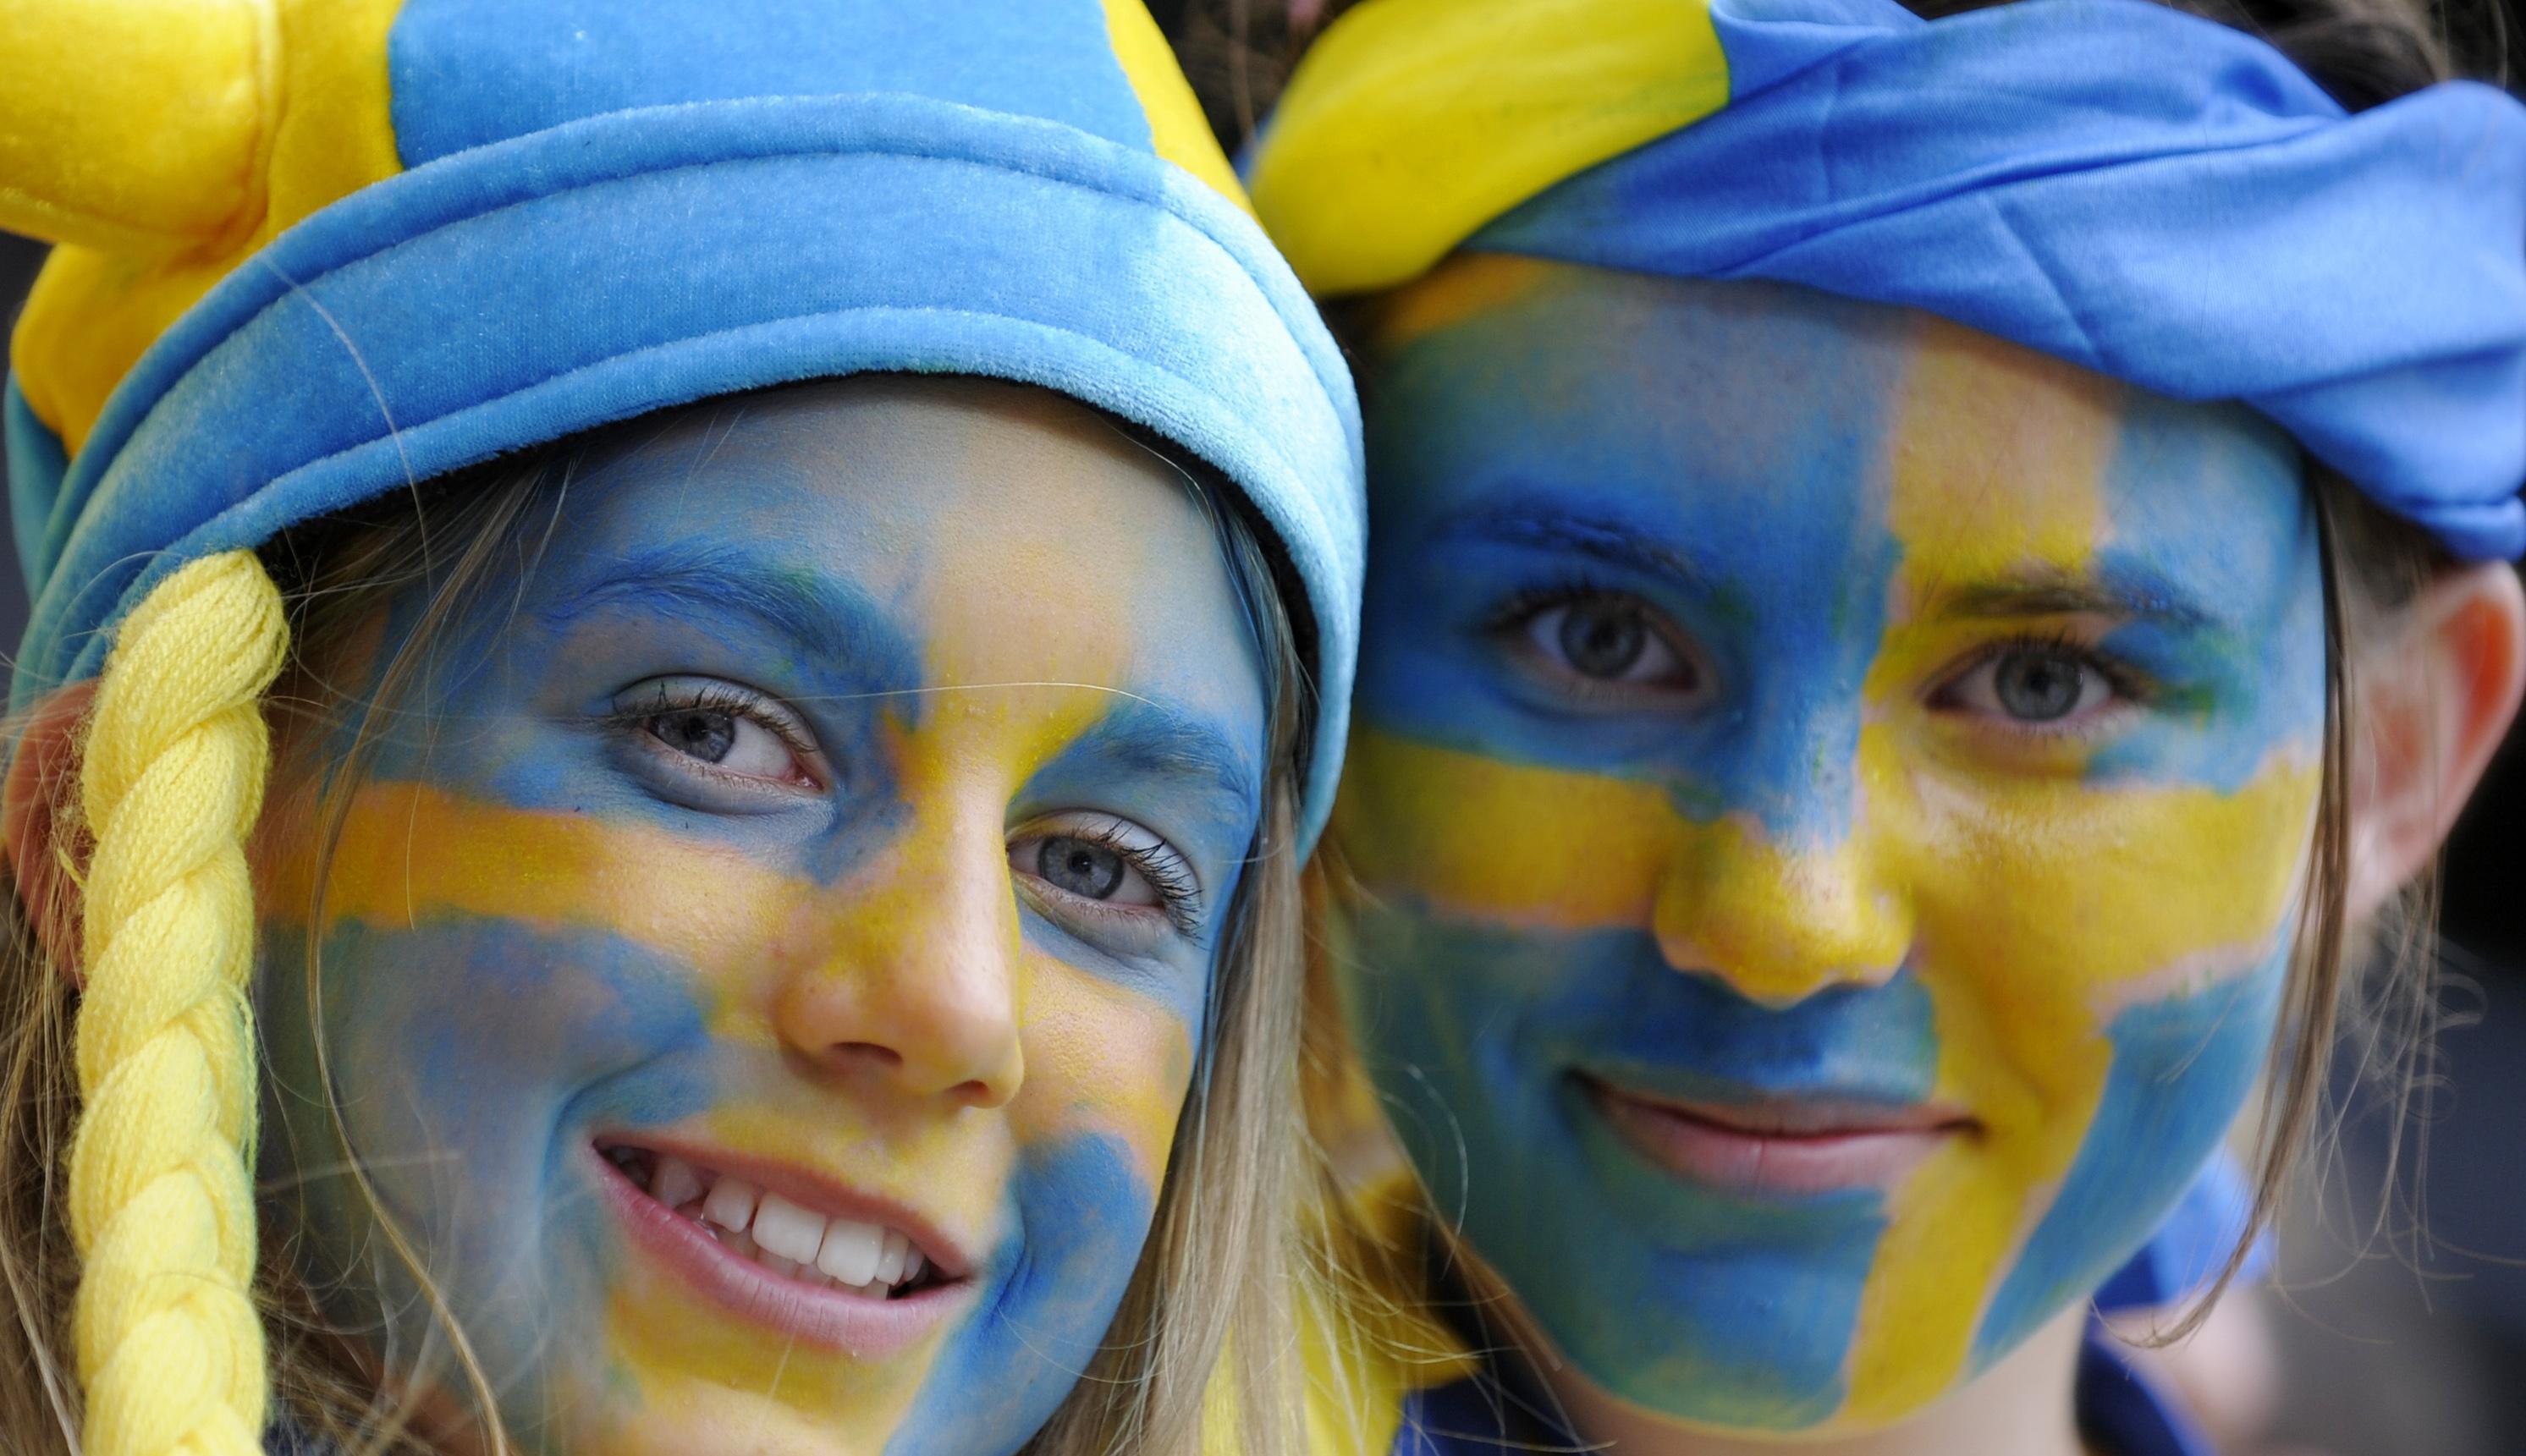 Sweden fans pose before their Group D Euro 2008 soccer match against Spain at the Tivoli Neu Stadium in Innsbruck, June 14, 2008.